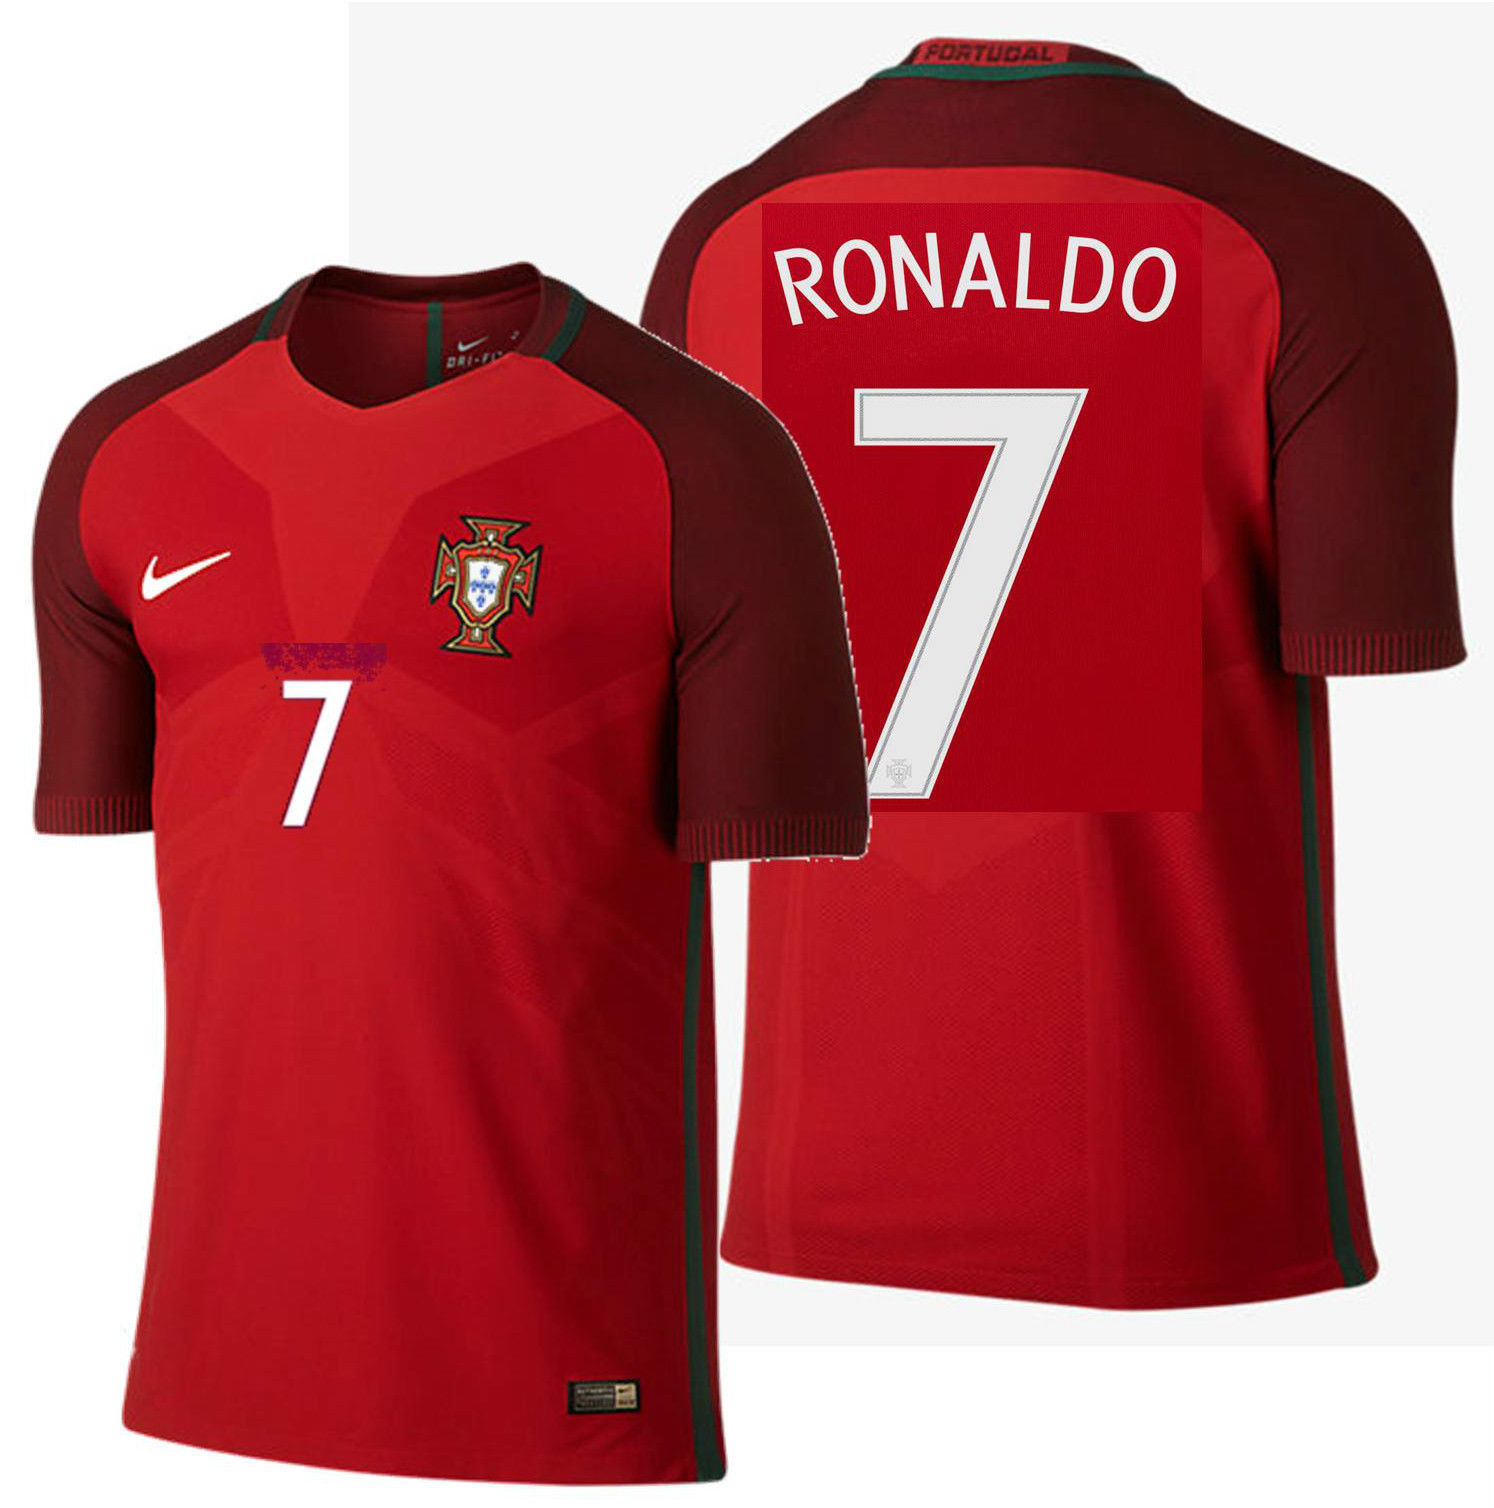 cristiano ronaldo jersey - 991×1000